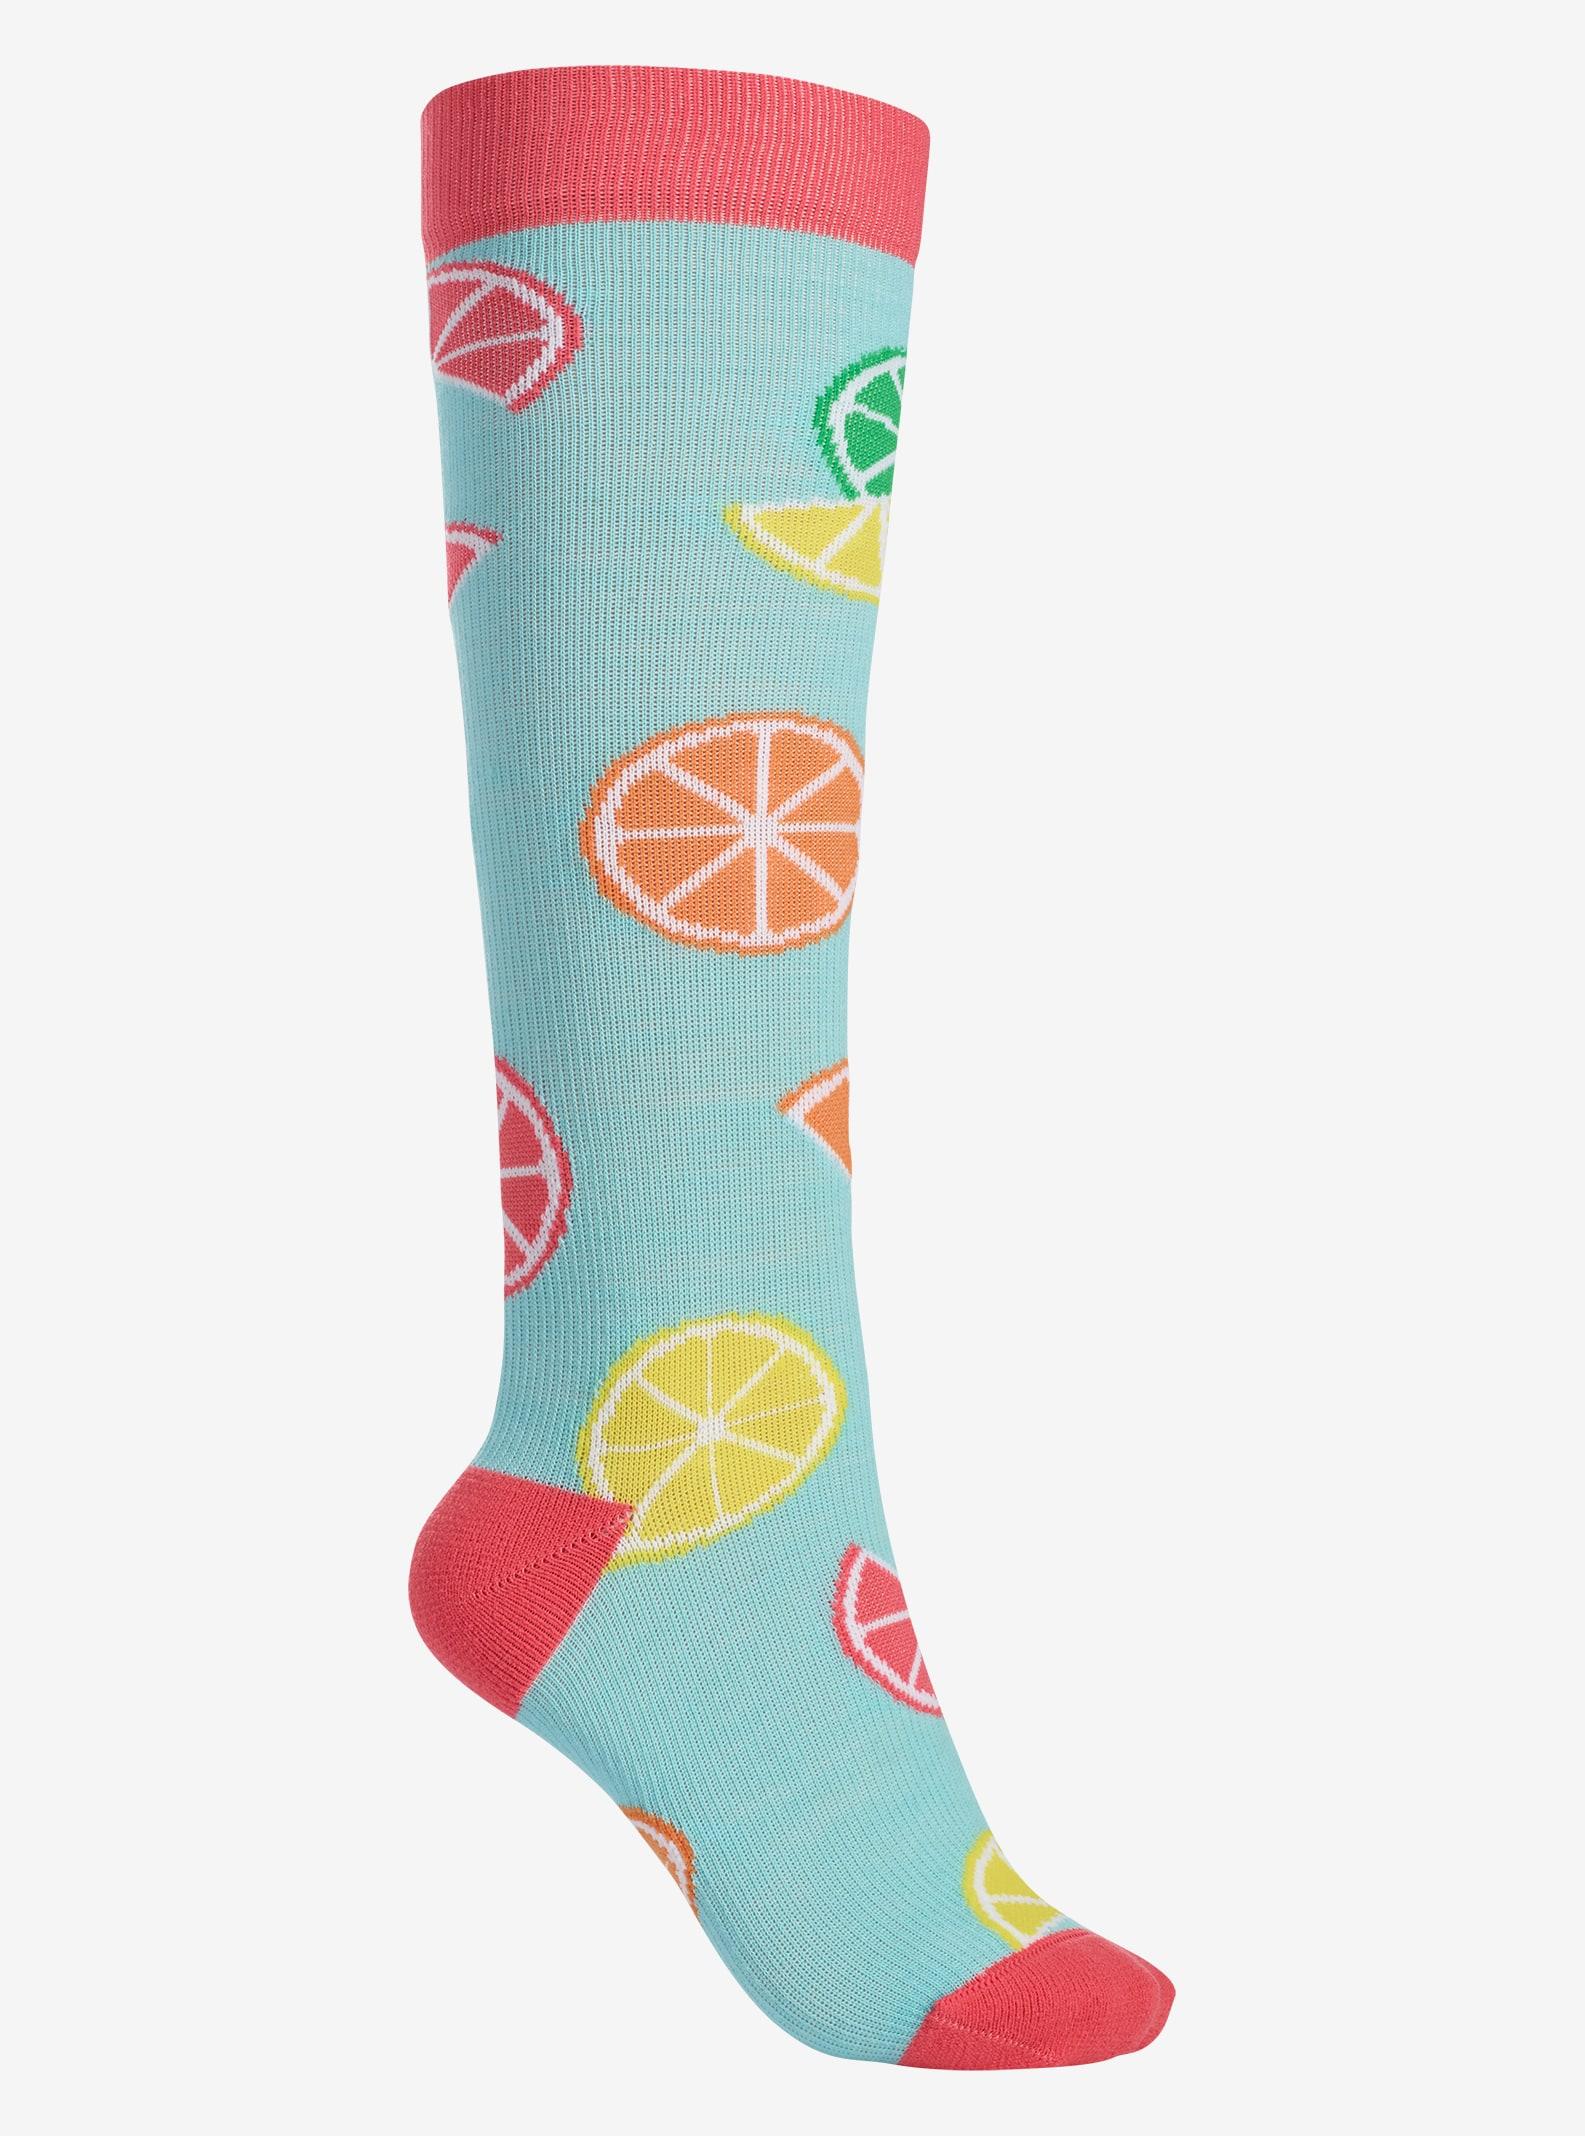 Women's Burton Super Party Sock shown in Citrus